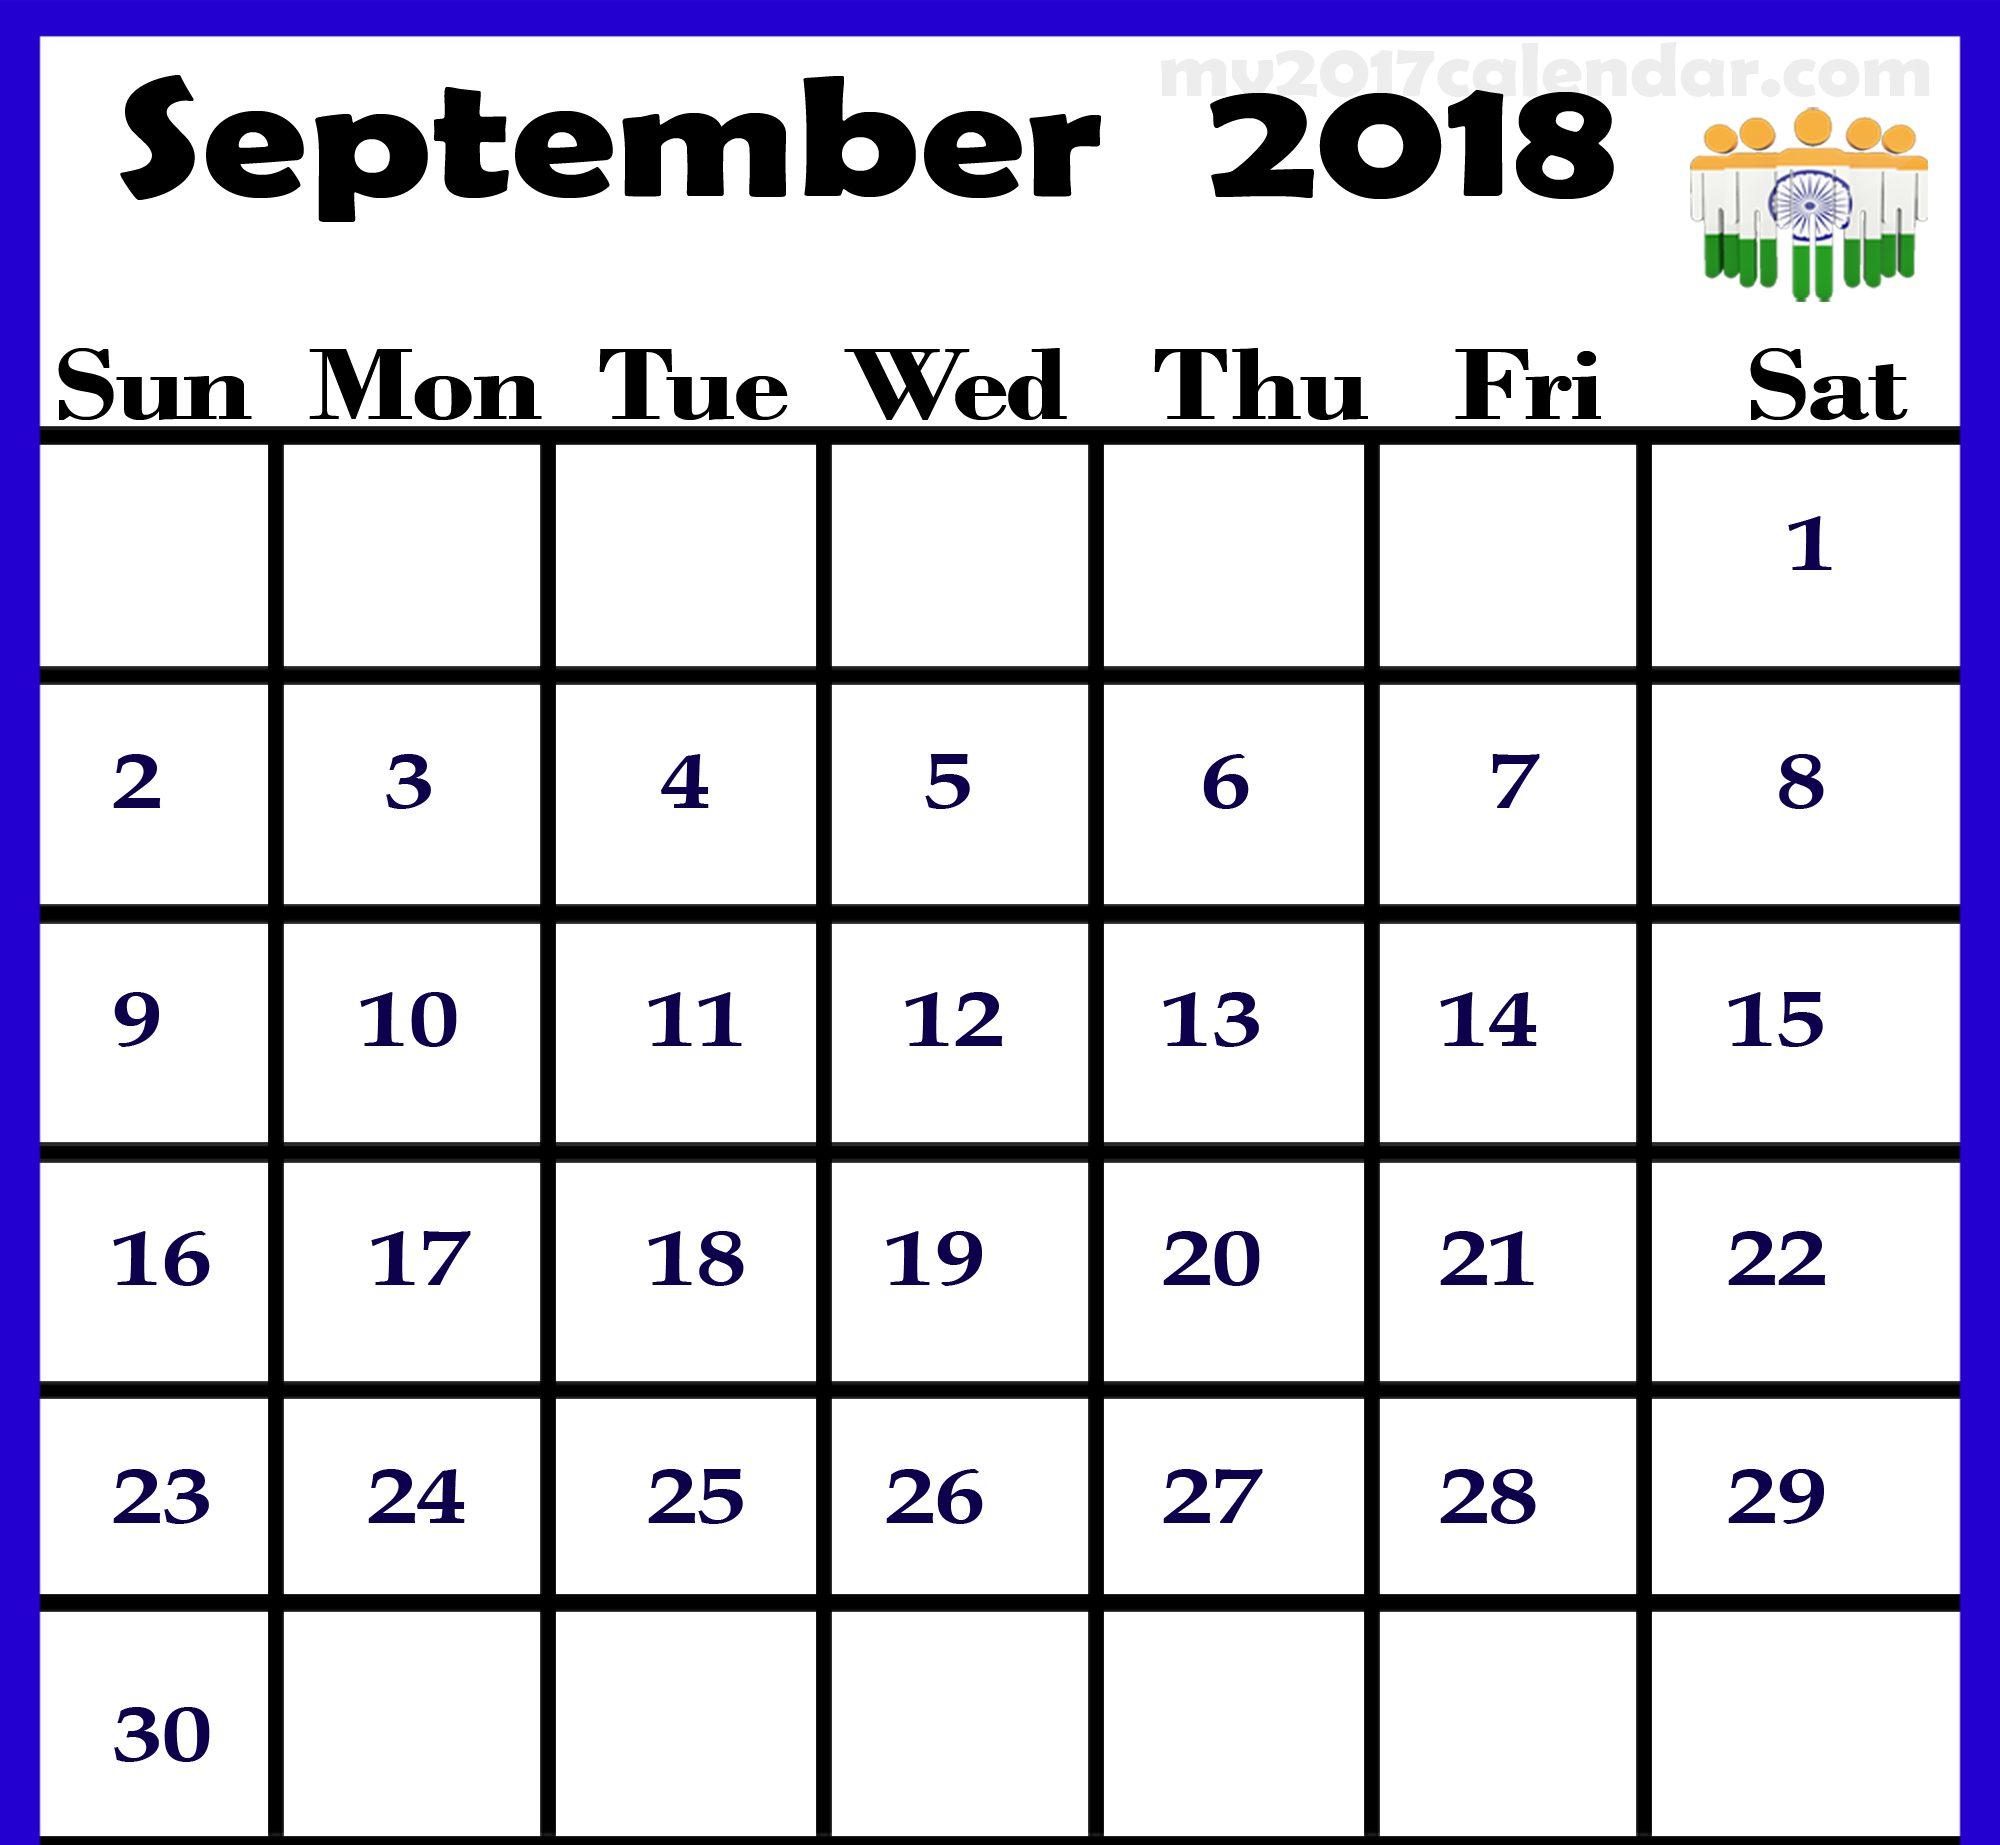 September 2018 Calendar India